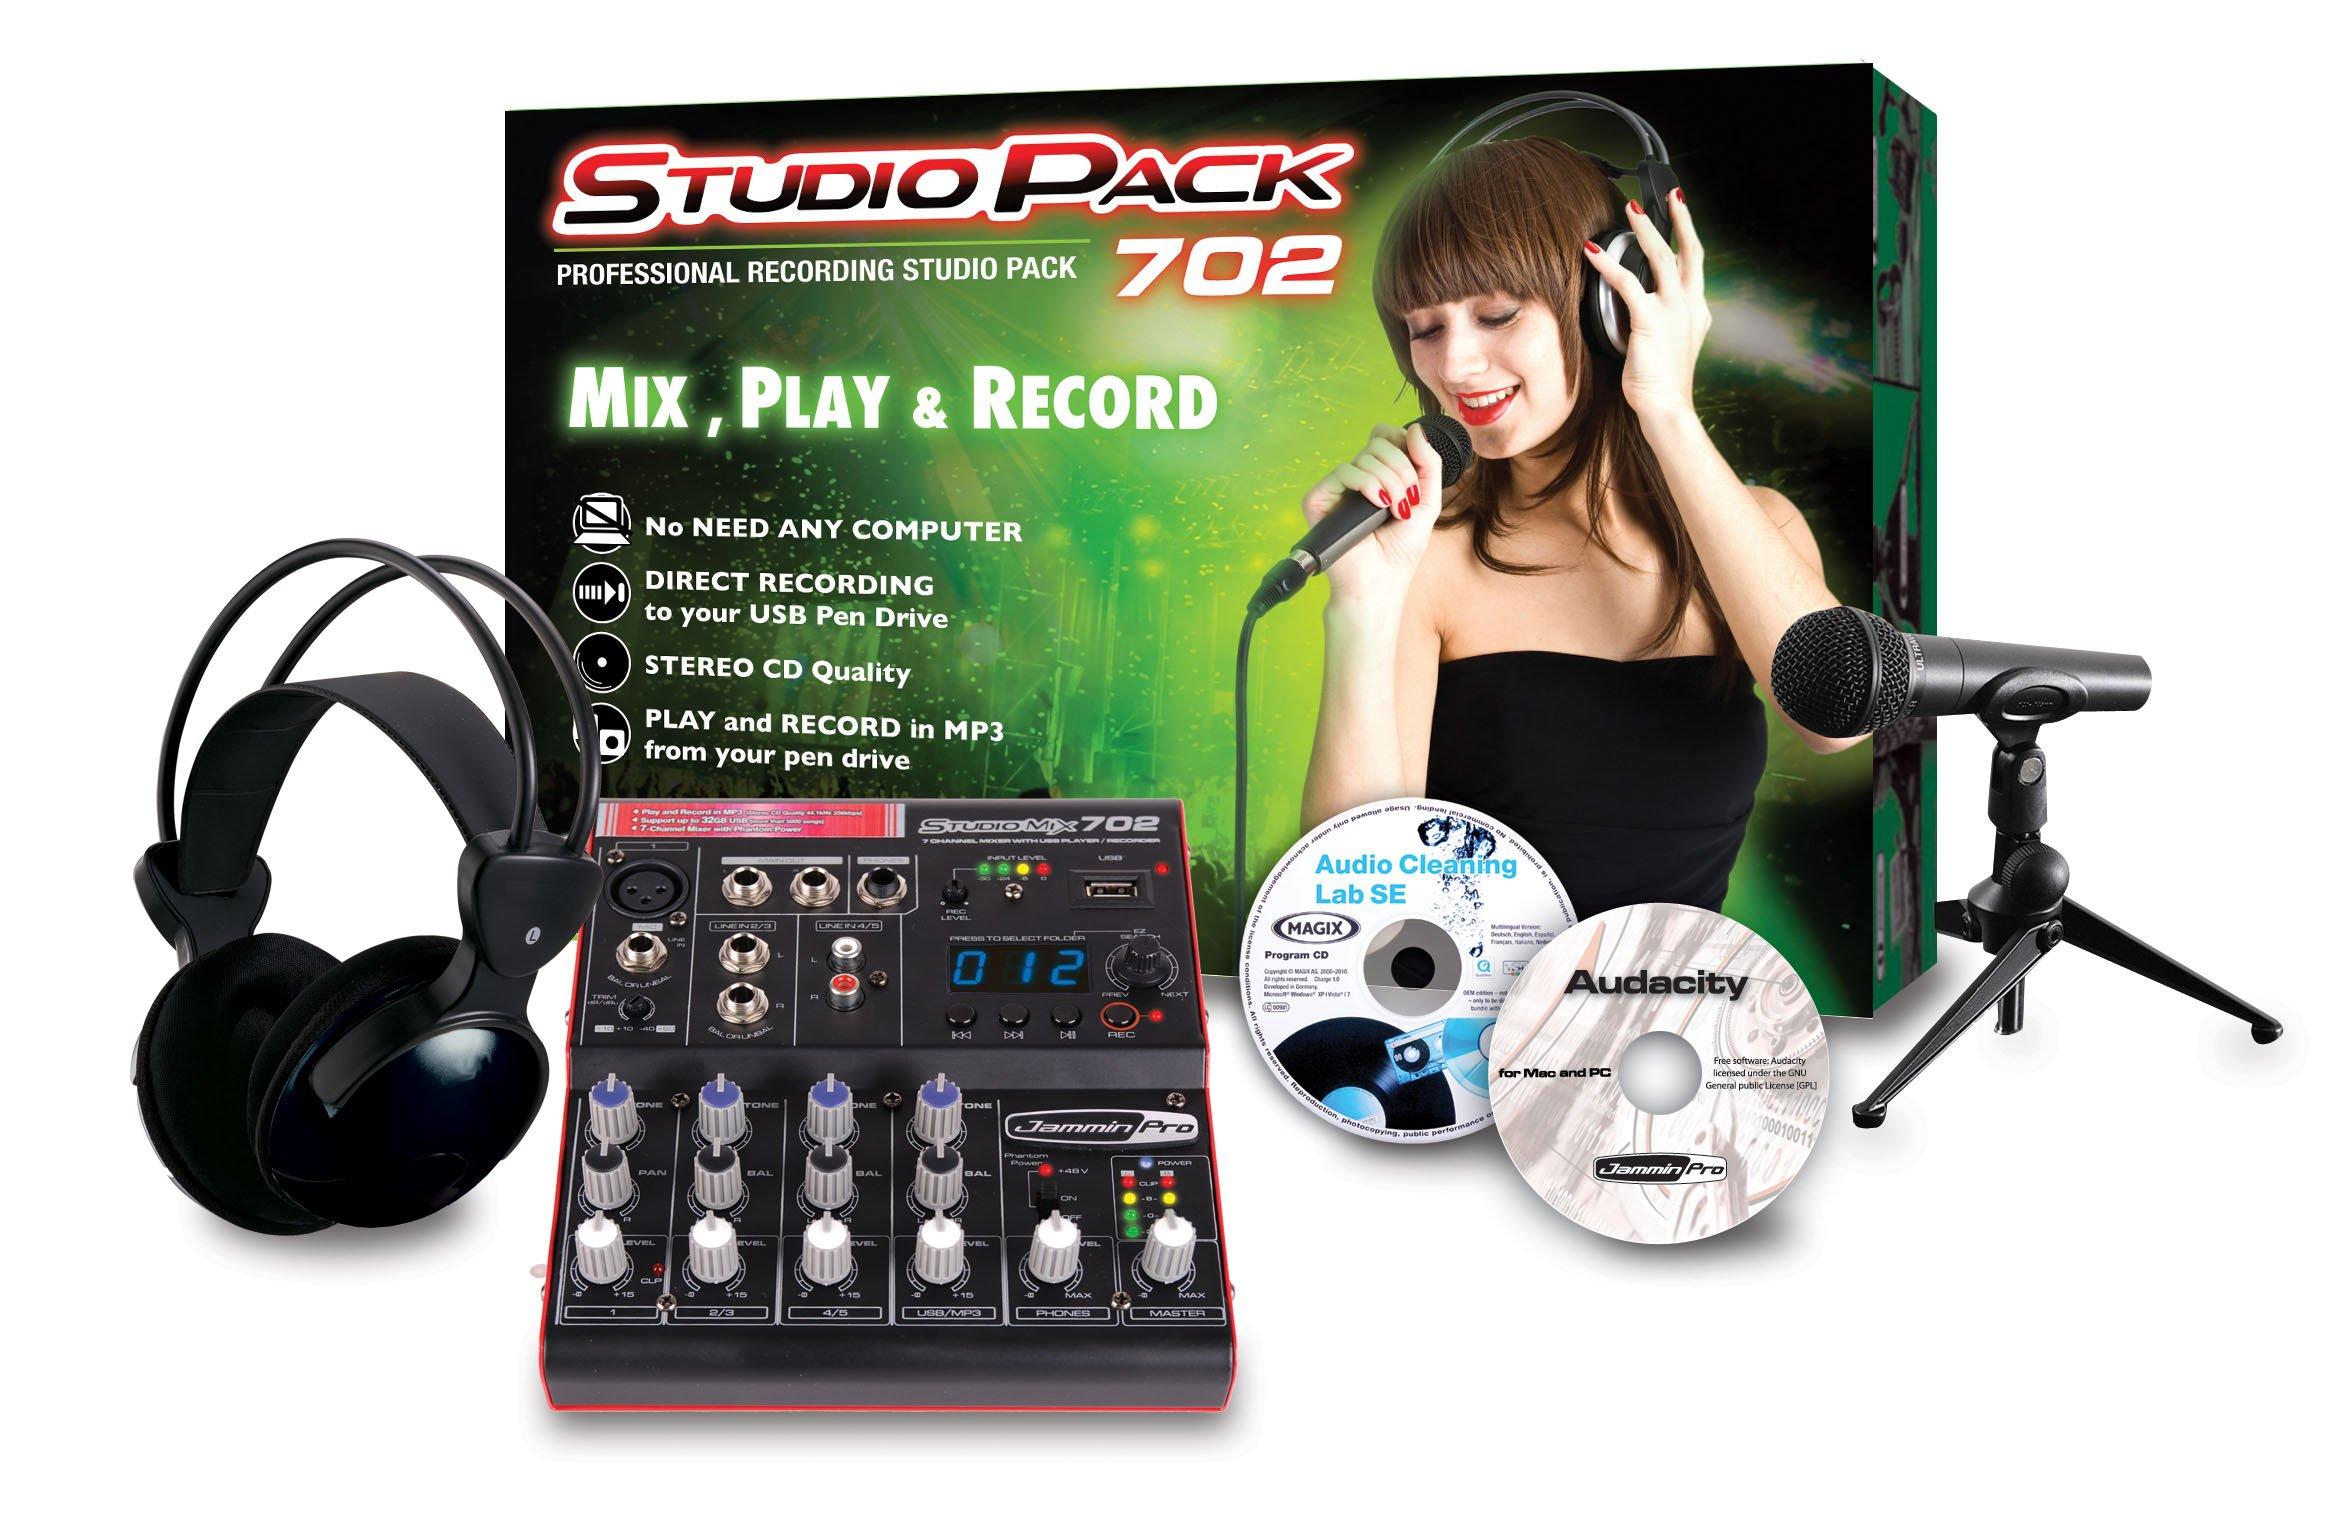 Jammin Pro STUDIOPACK702 Studio Flash Recorder by Jammin Pro